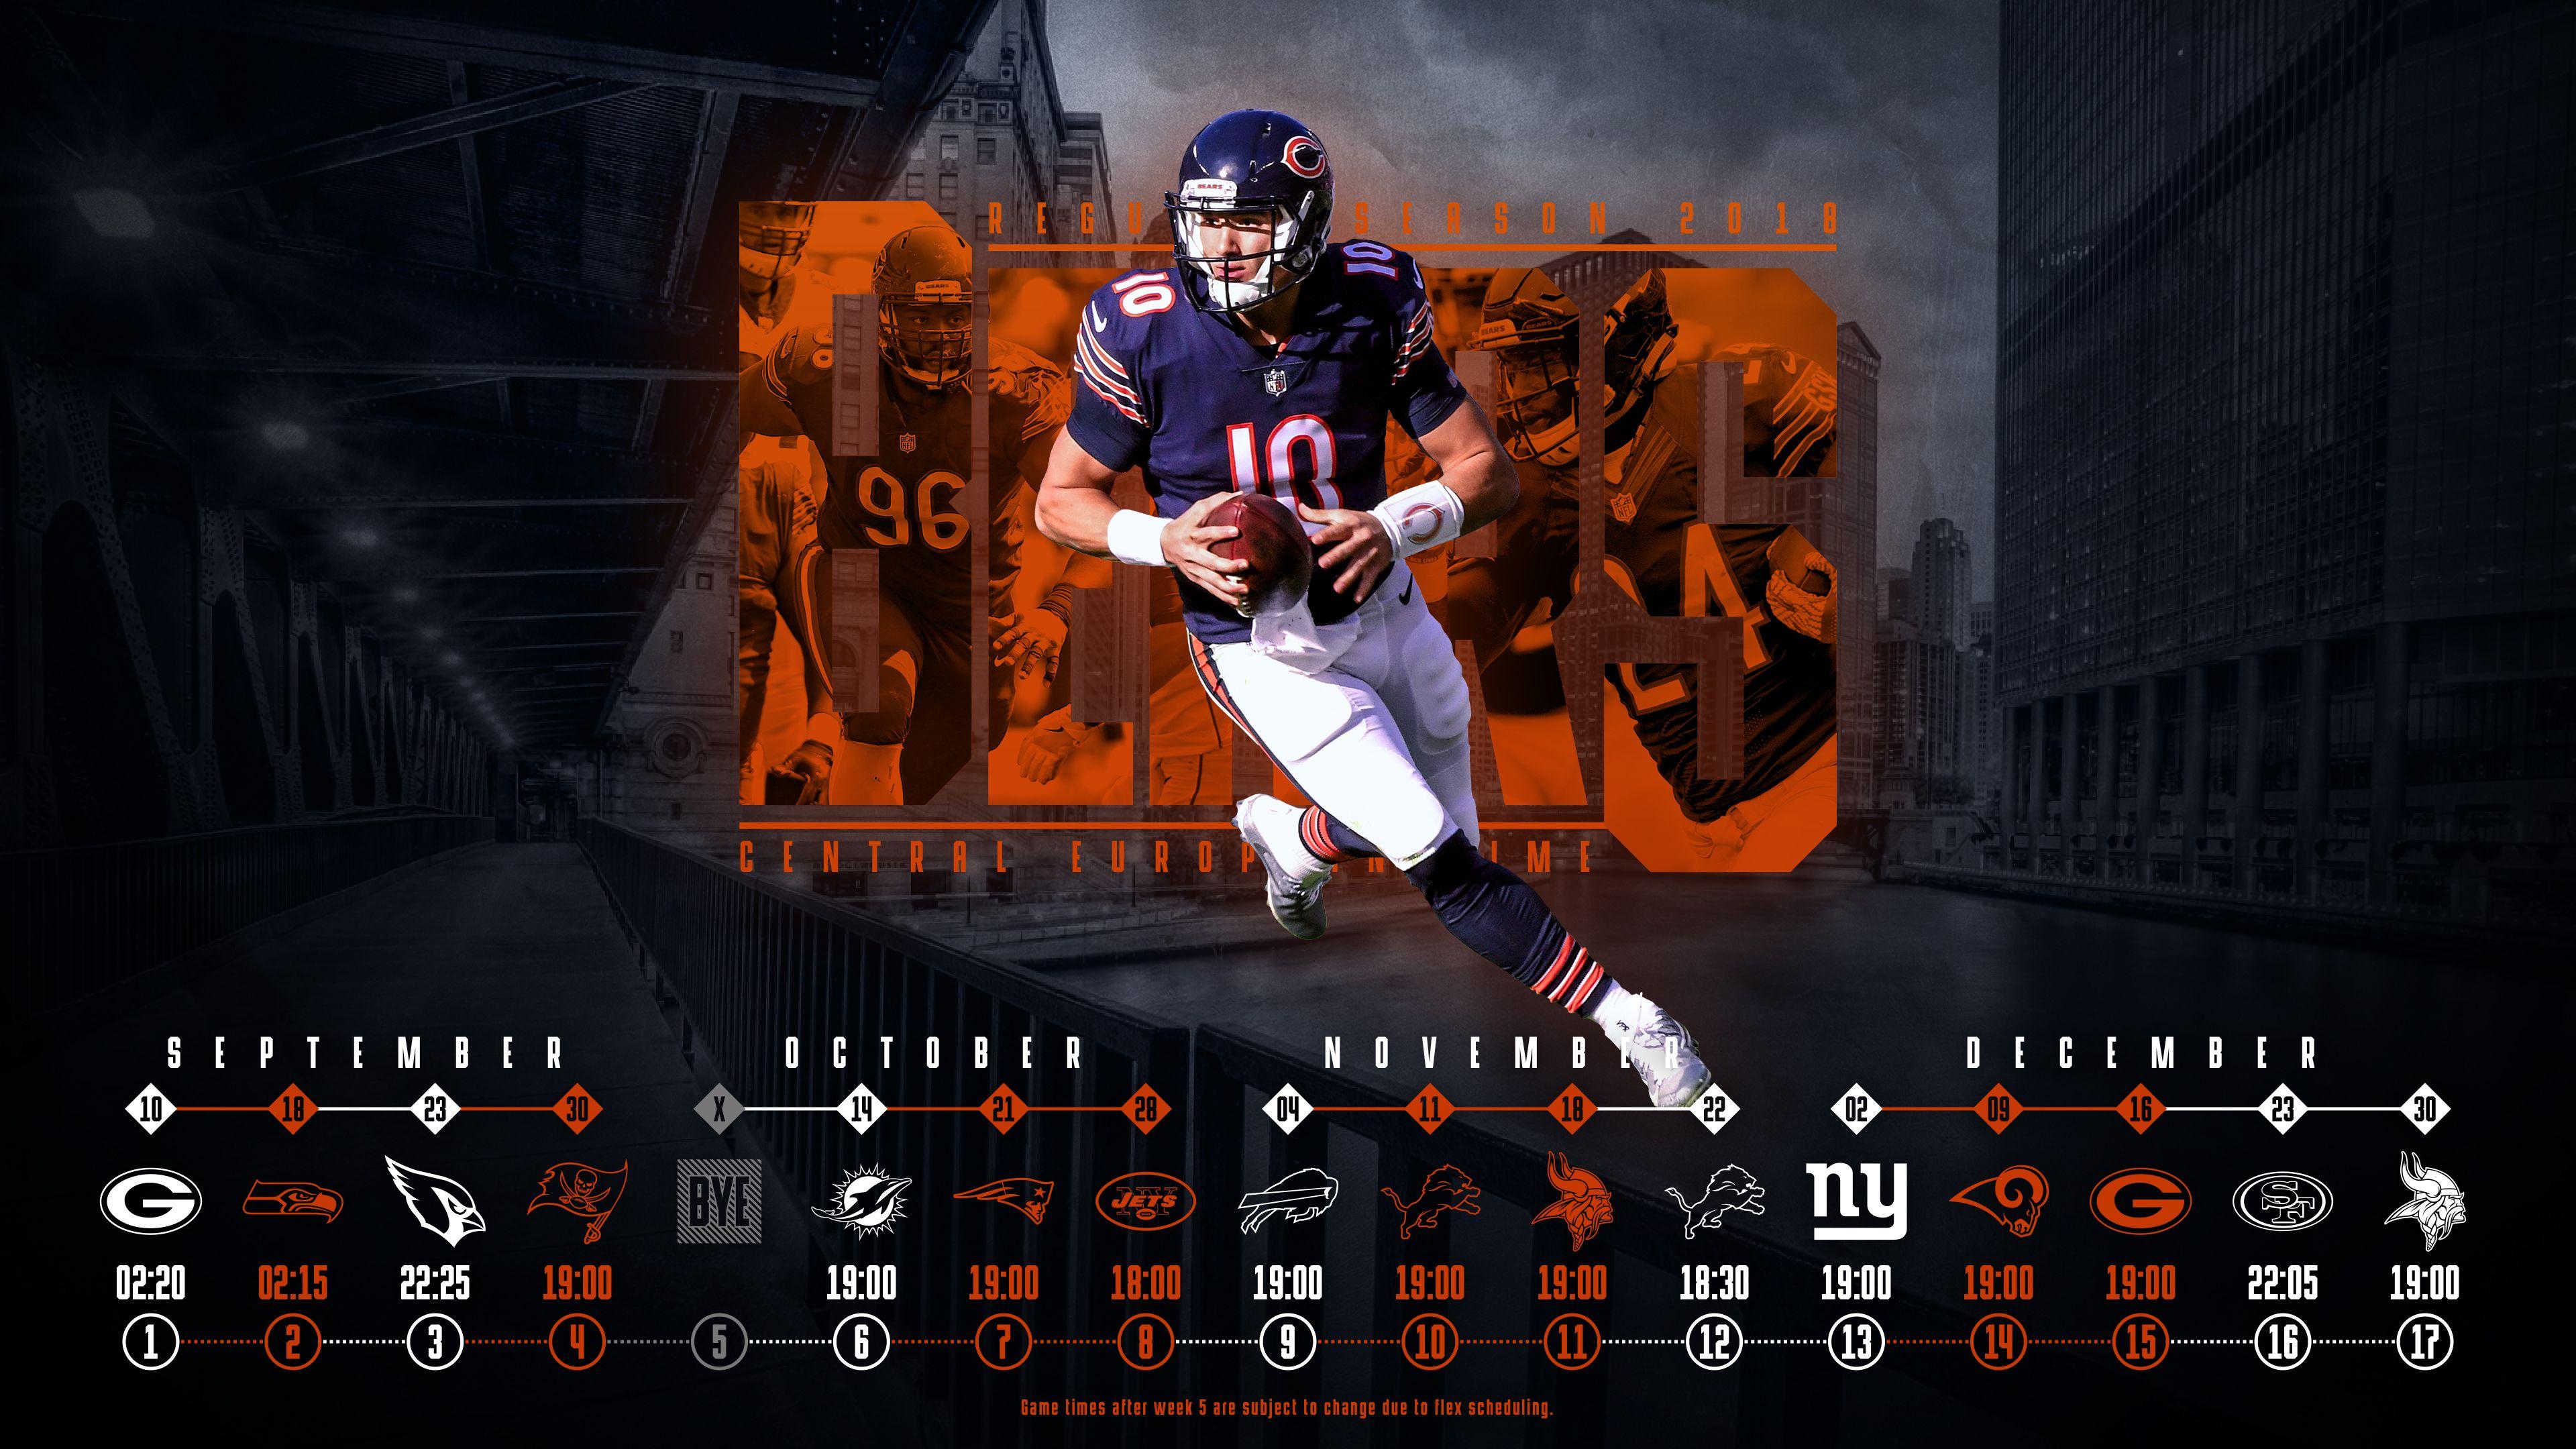 Schedule wallpaper for the Chicago Bears Regular Season